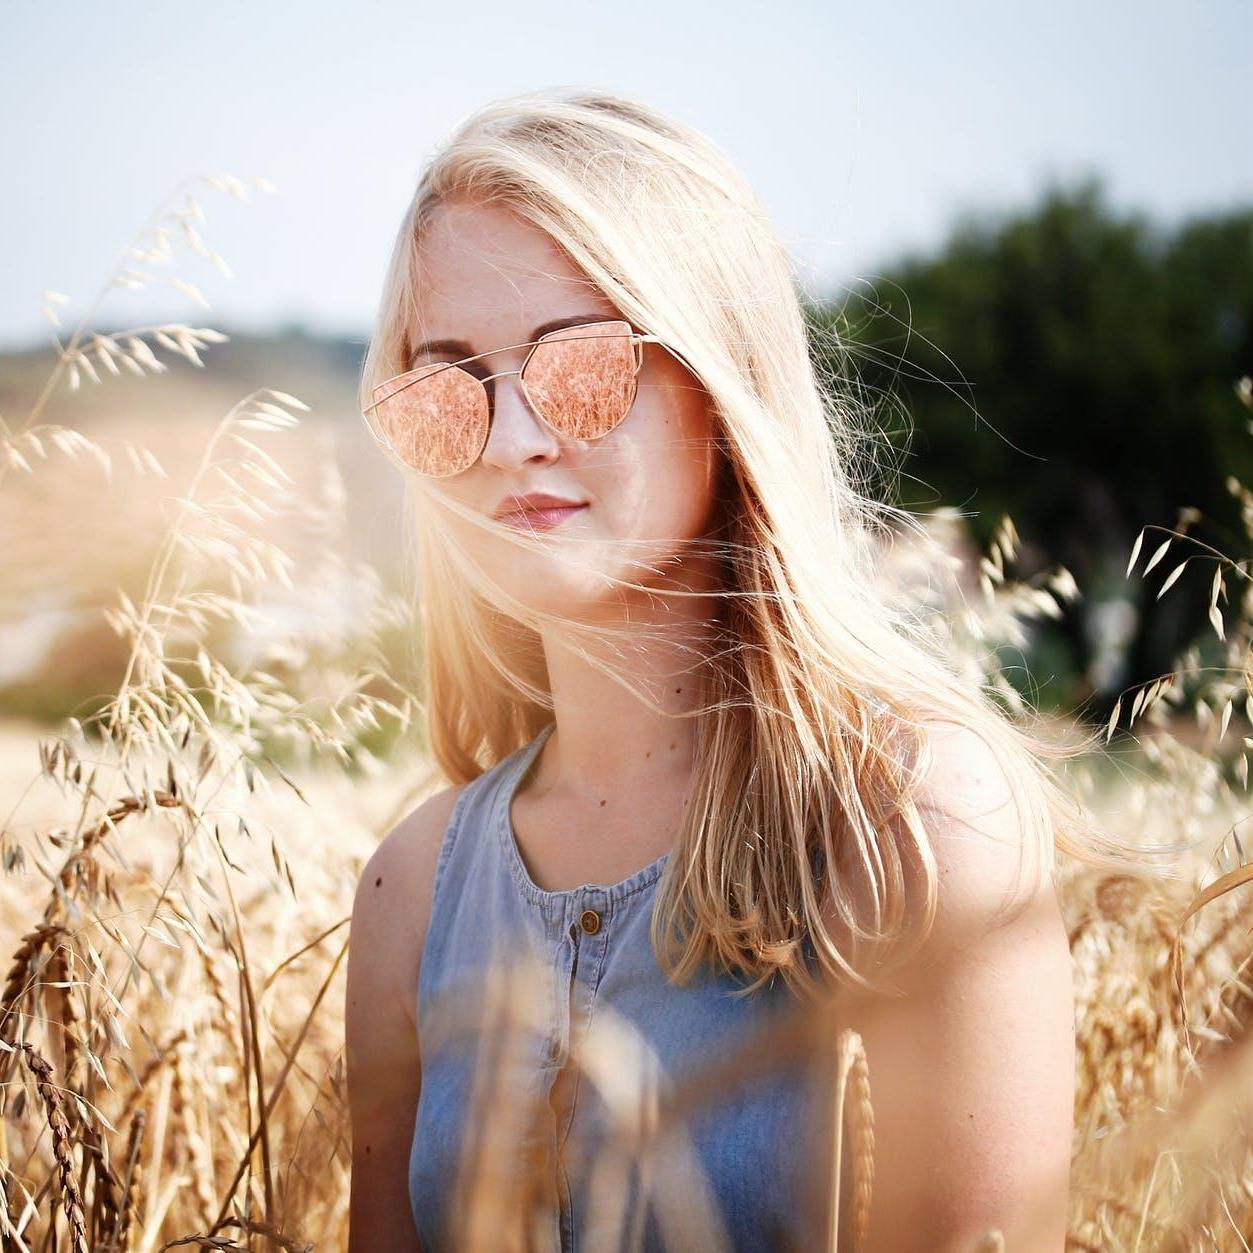 Emma Ludwig